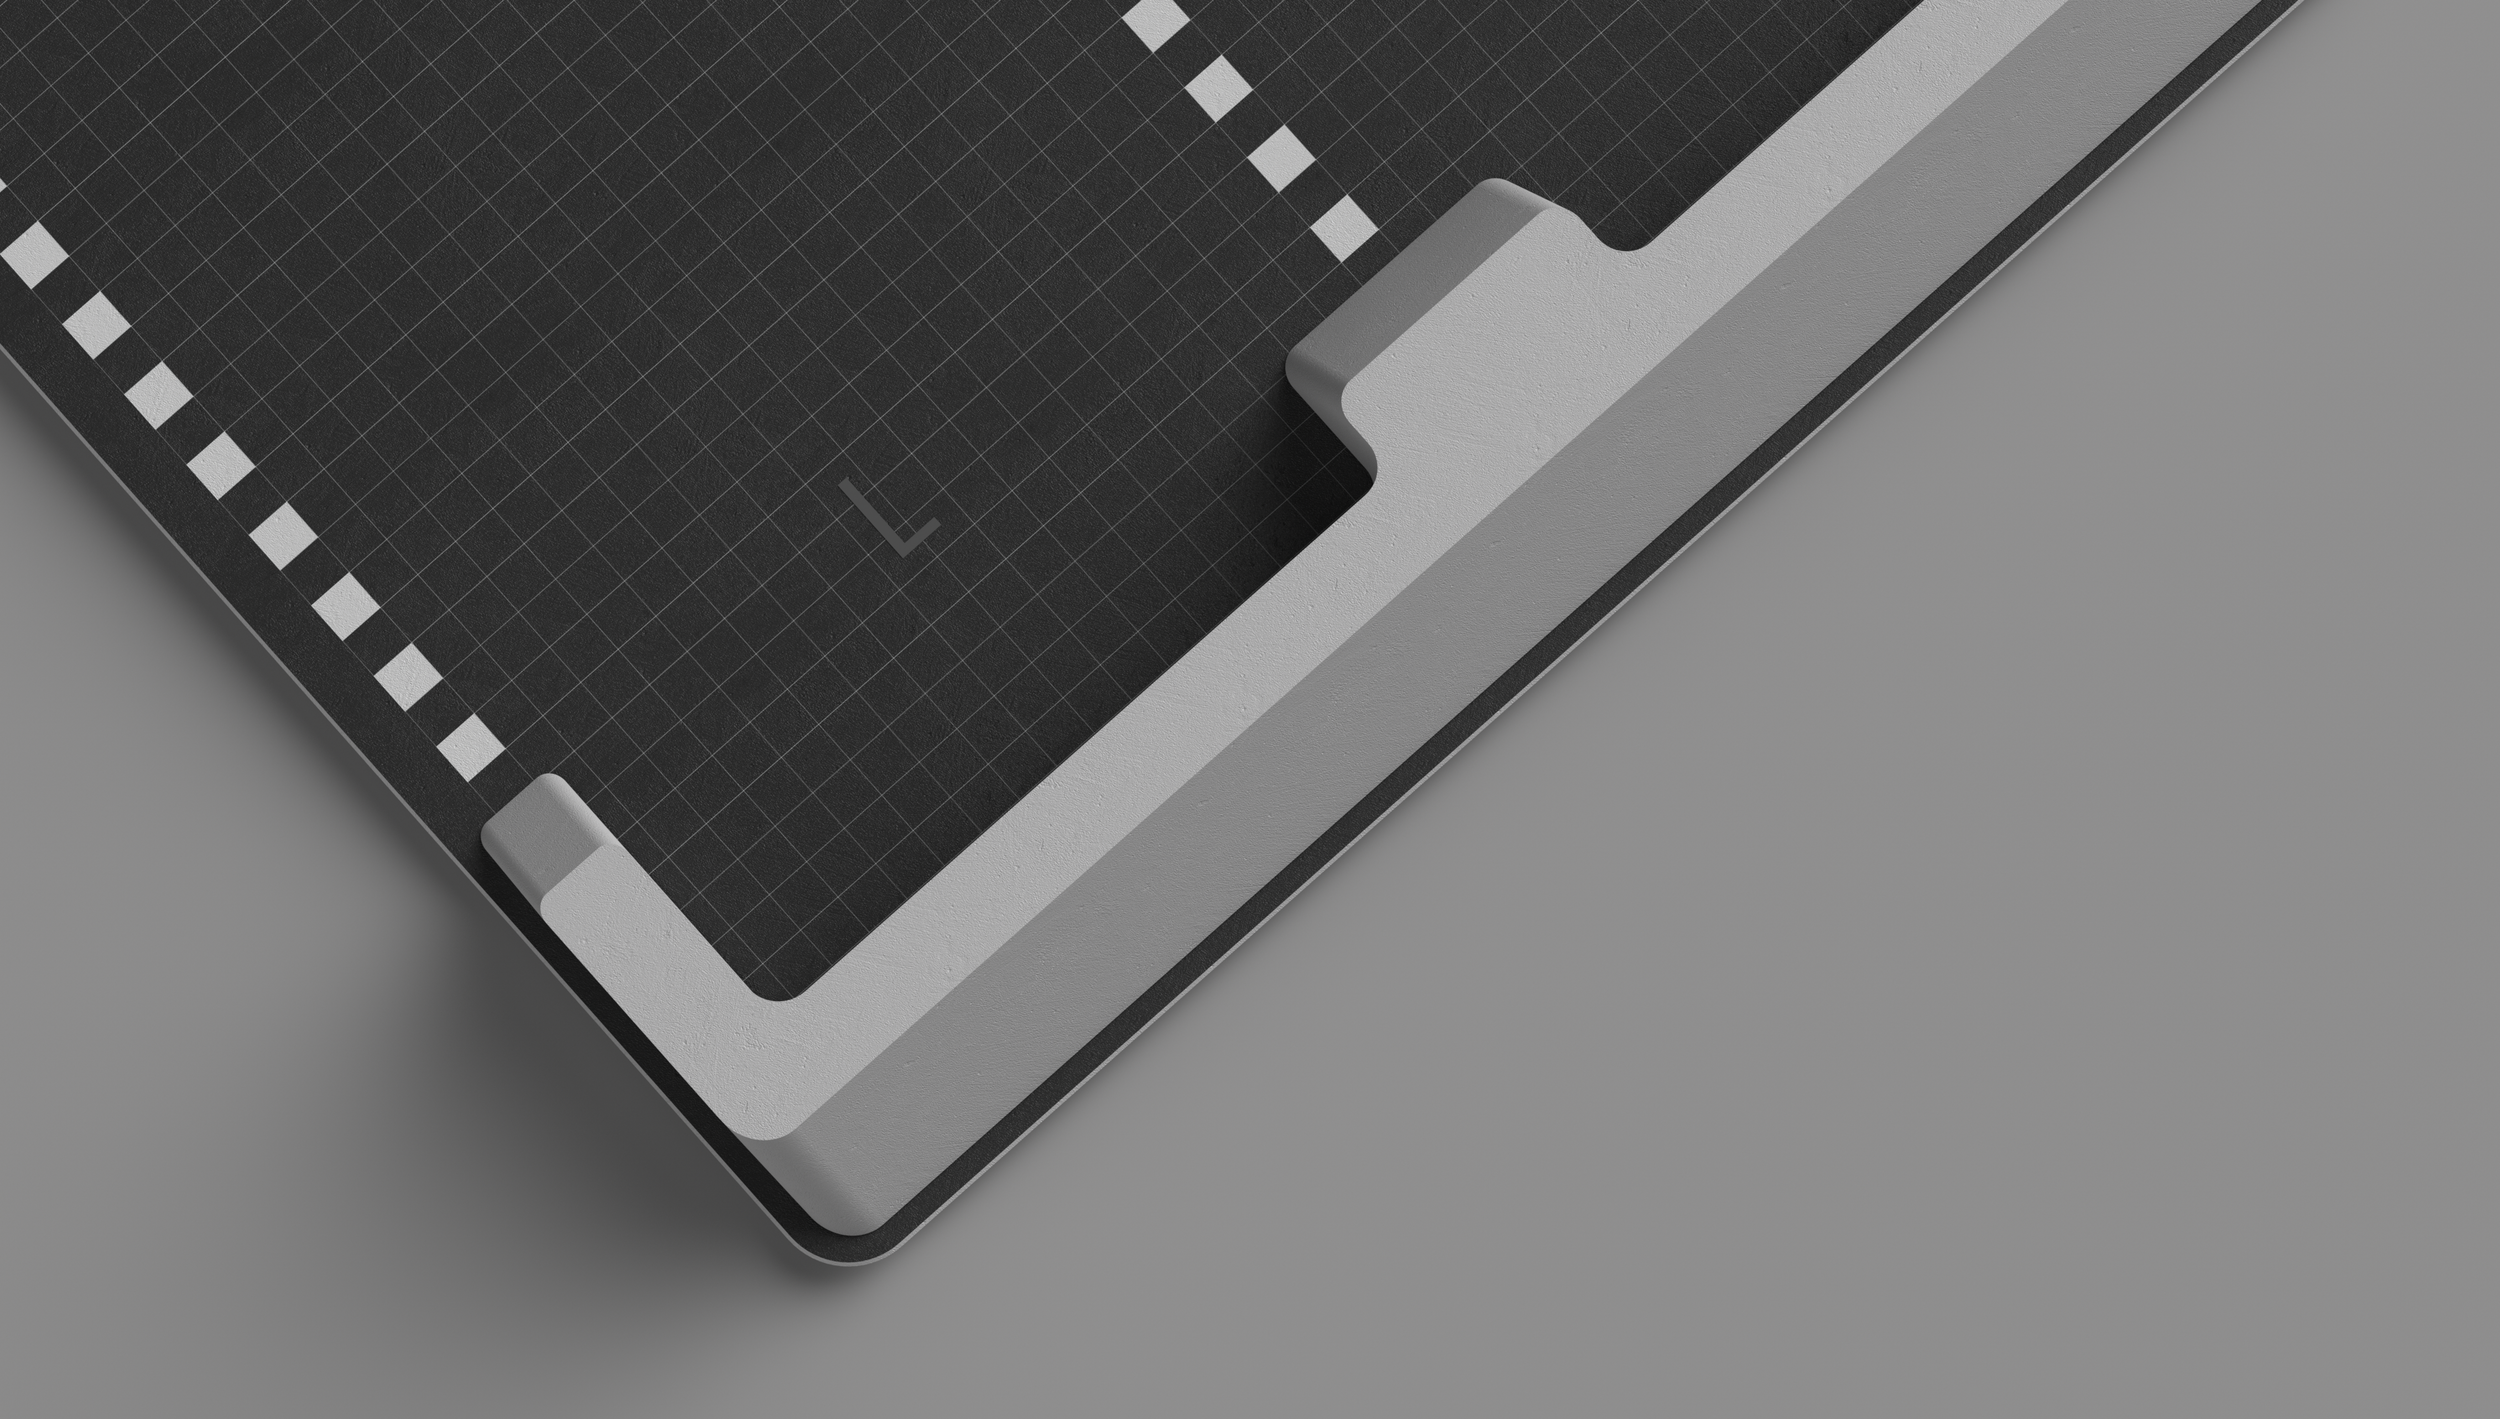 Mat_Design_19.png